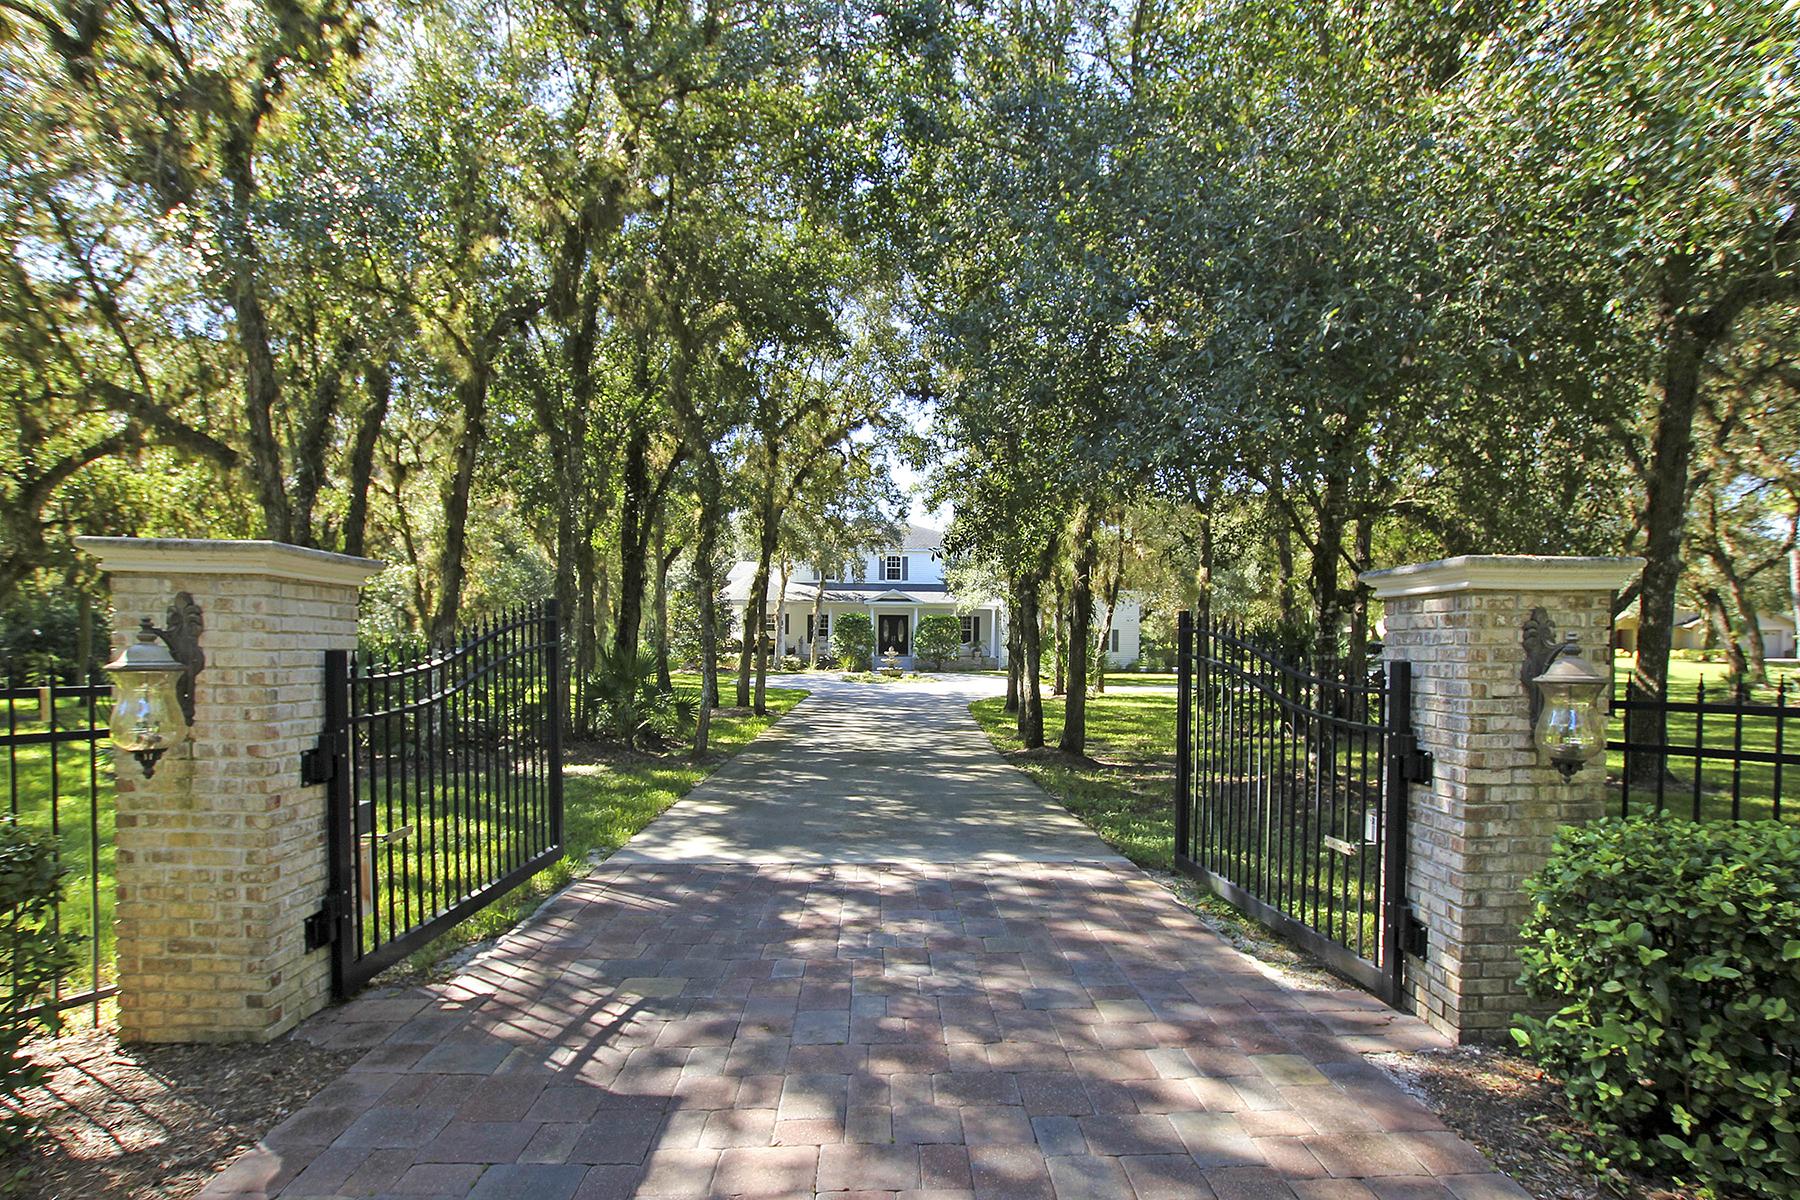 Single Family Home for Sale at ALVA 17280 Frank Rd Alva, Florida, 33920 United States